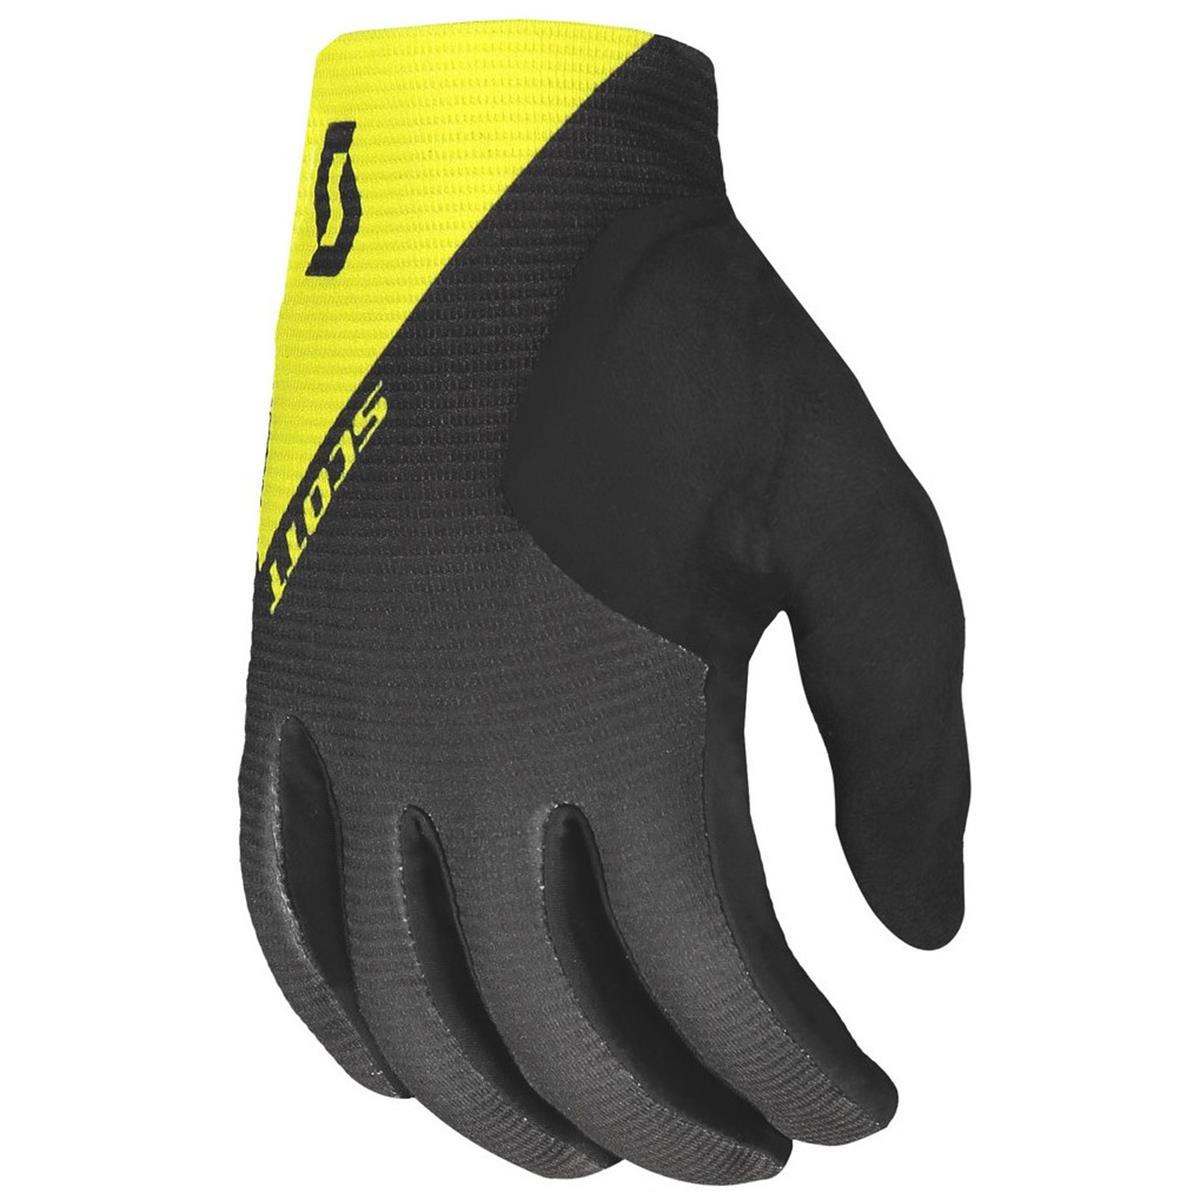 Scott Bike-Handschuhe Ridance Dunkelgrau/Sulphur Gelb